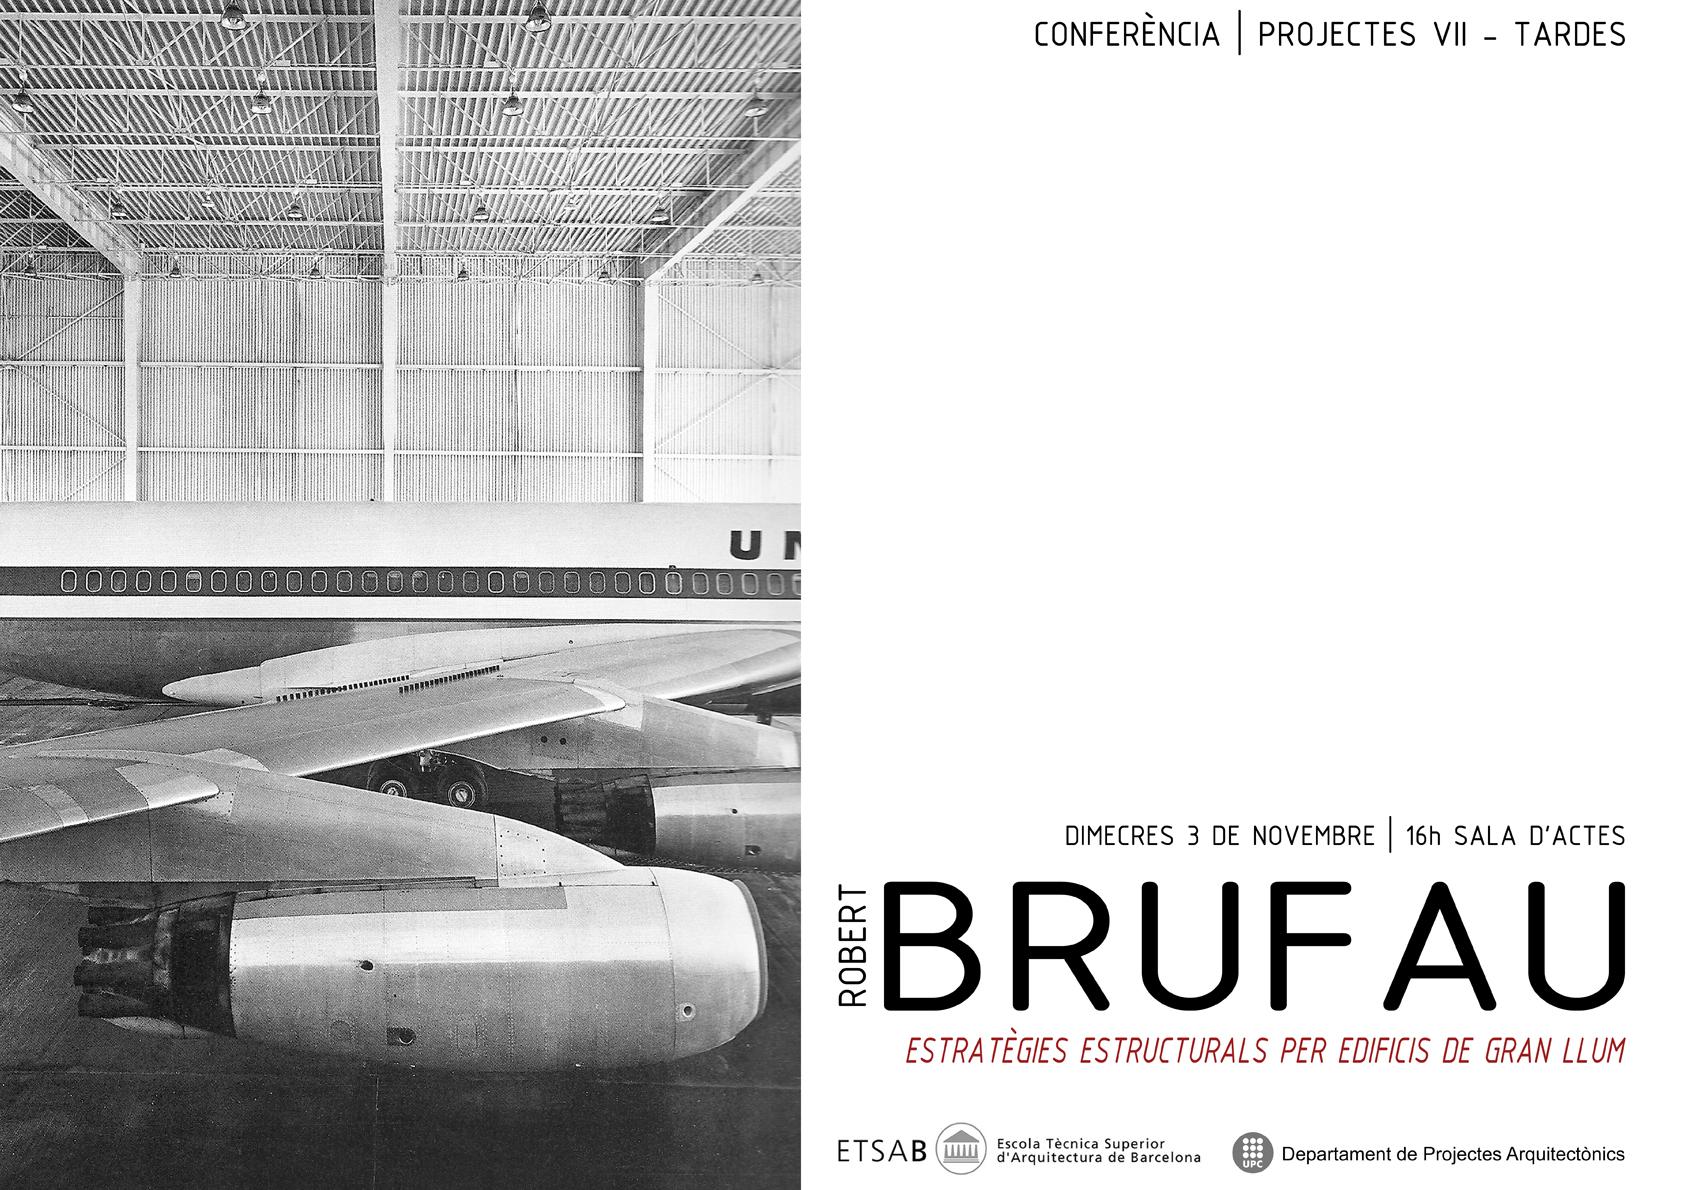 BRUFAU_1.jpg